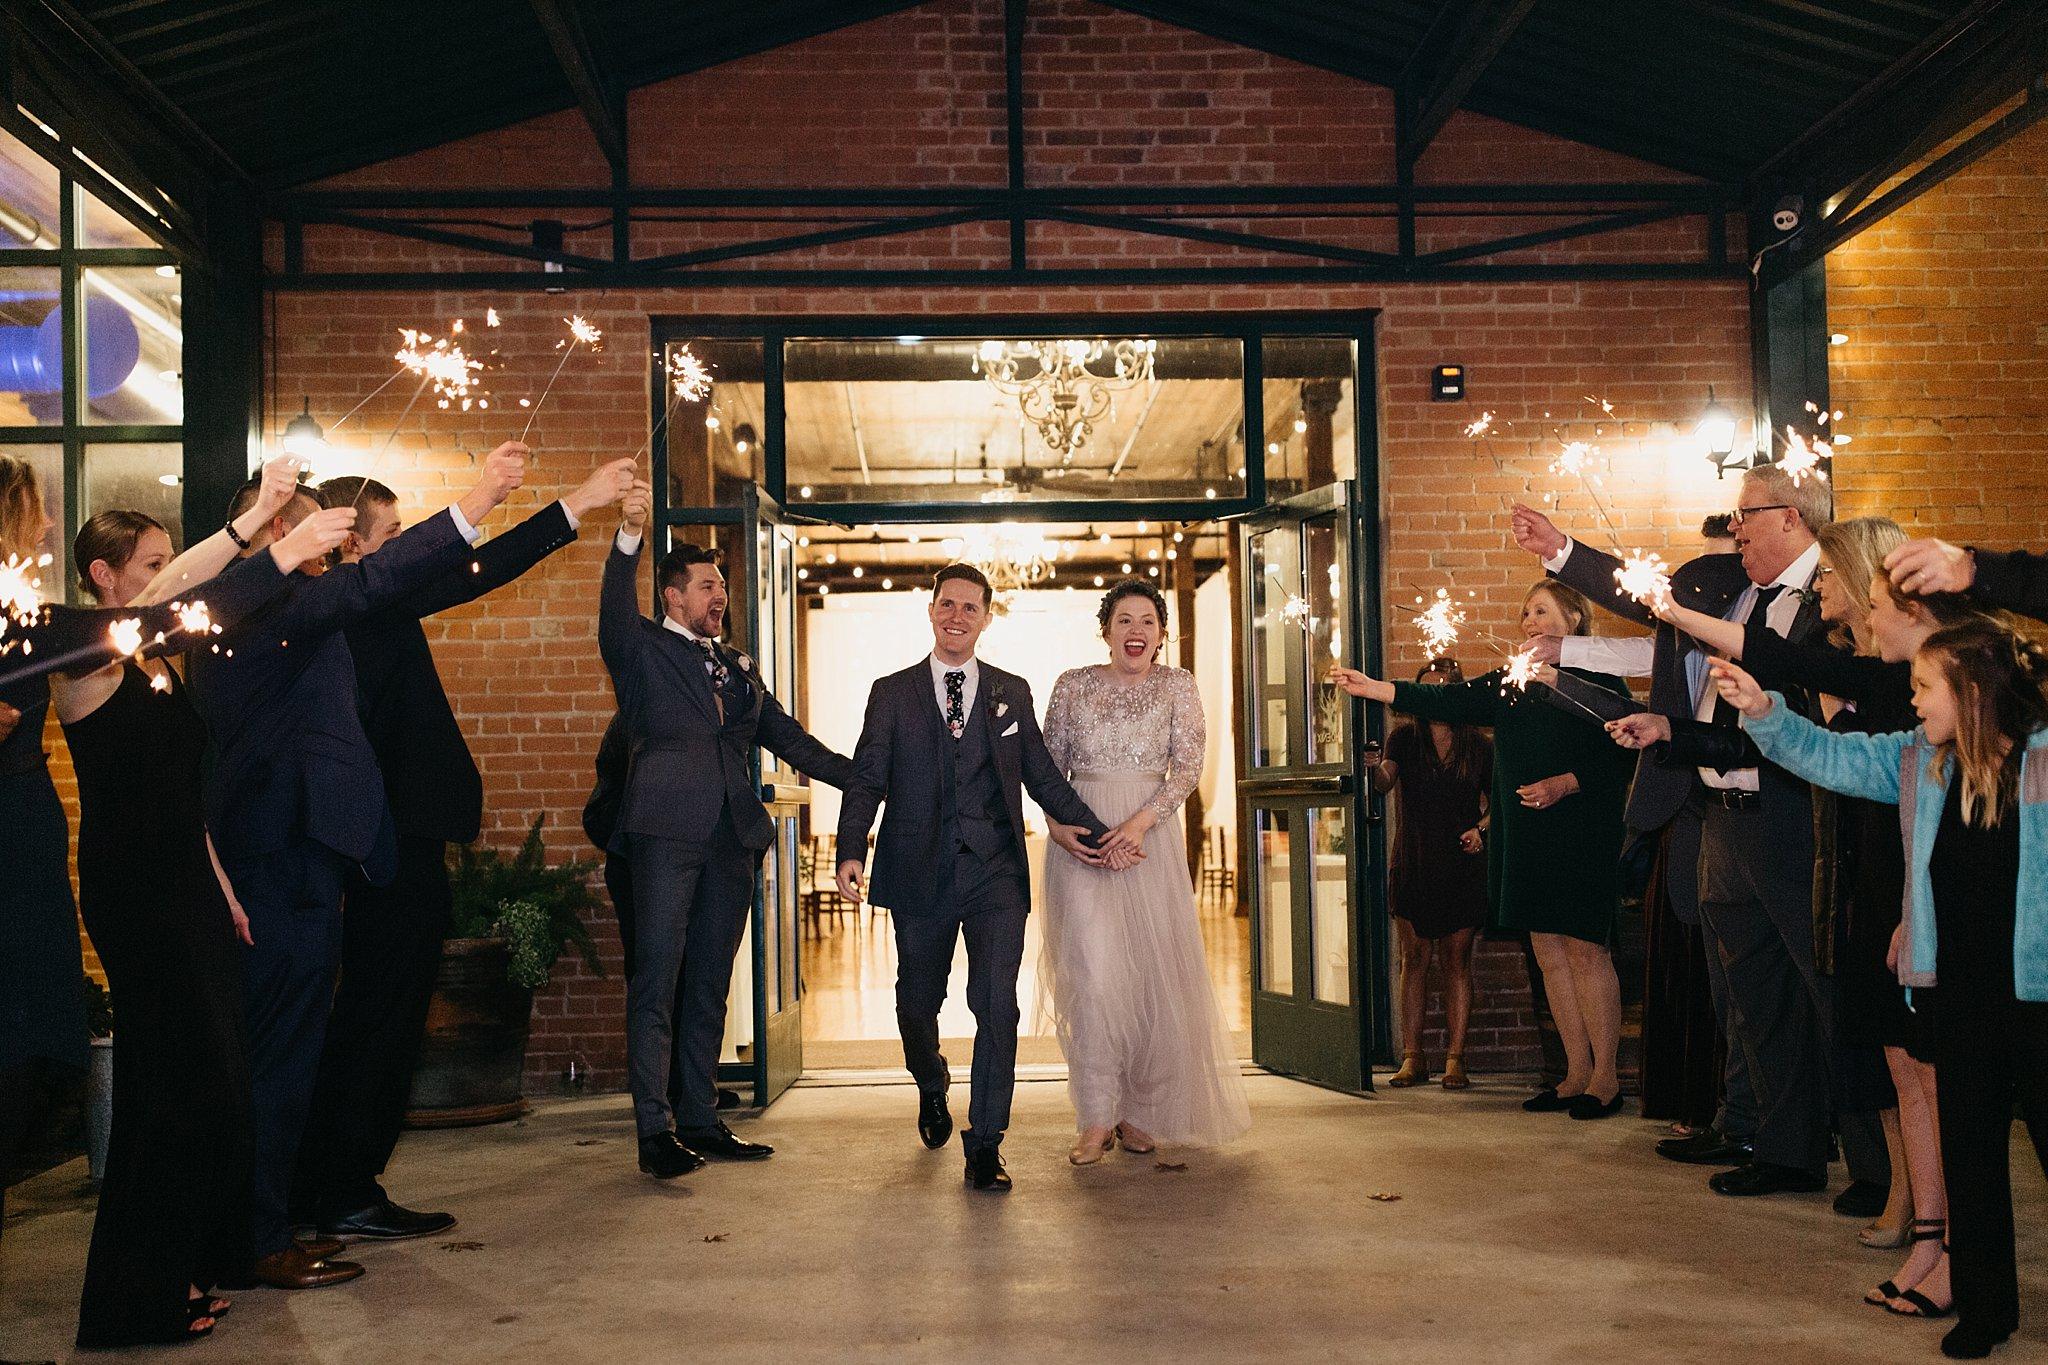 Wilderlove Co_Waco Texas_The Phoenix_Romantic Wedding Photography_0100.jpg